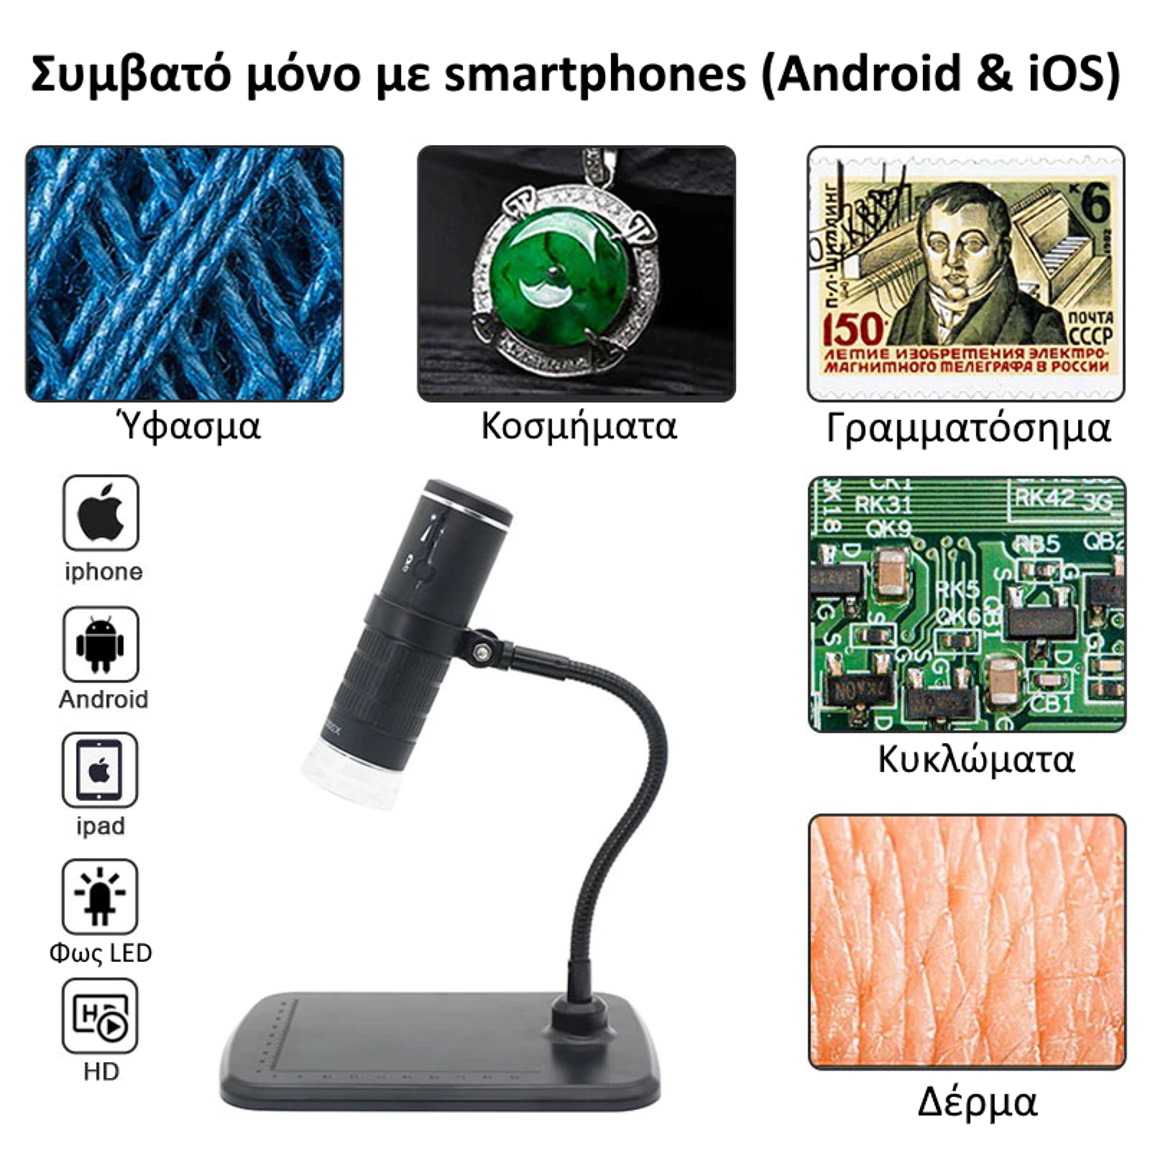 Eccomum ψηφιακό μικροσκόπιο